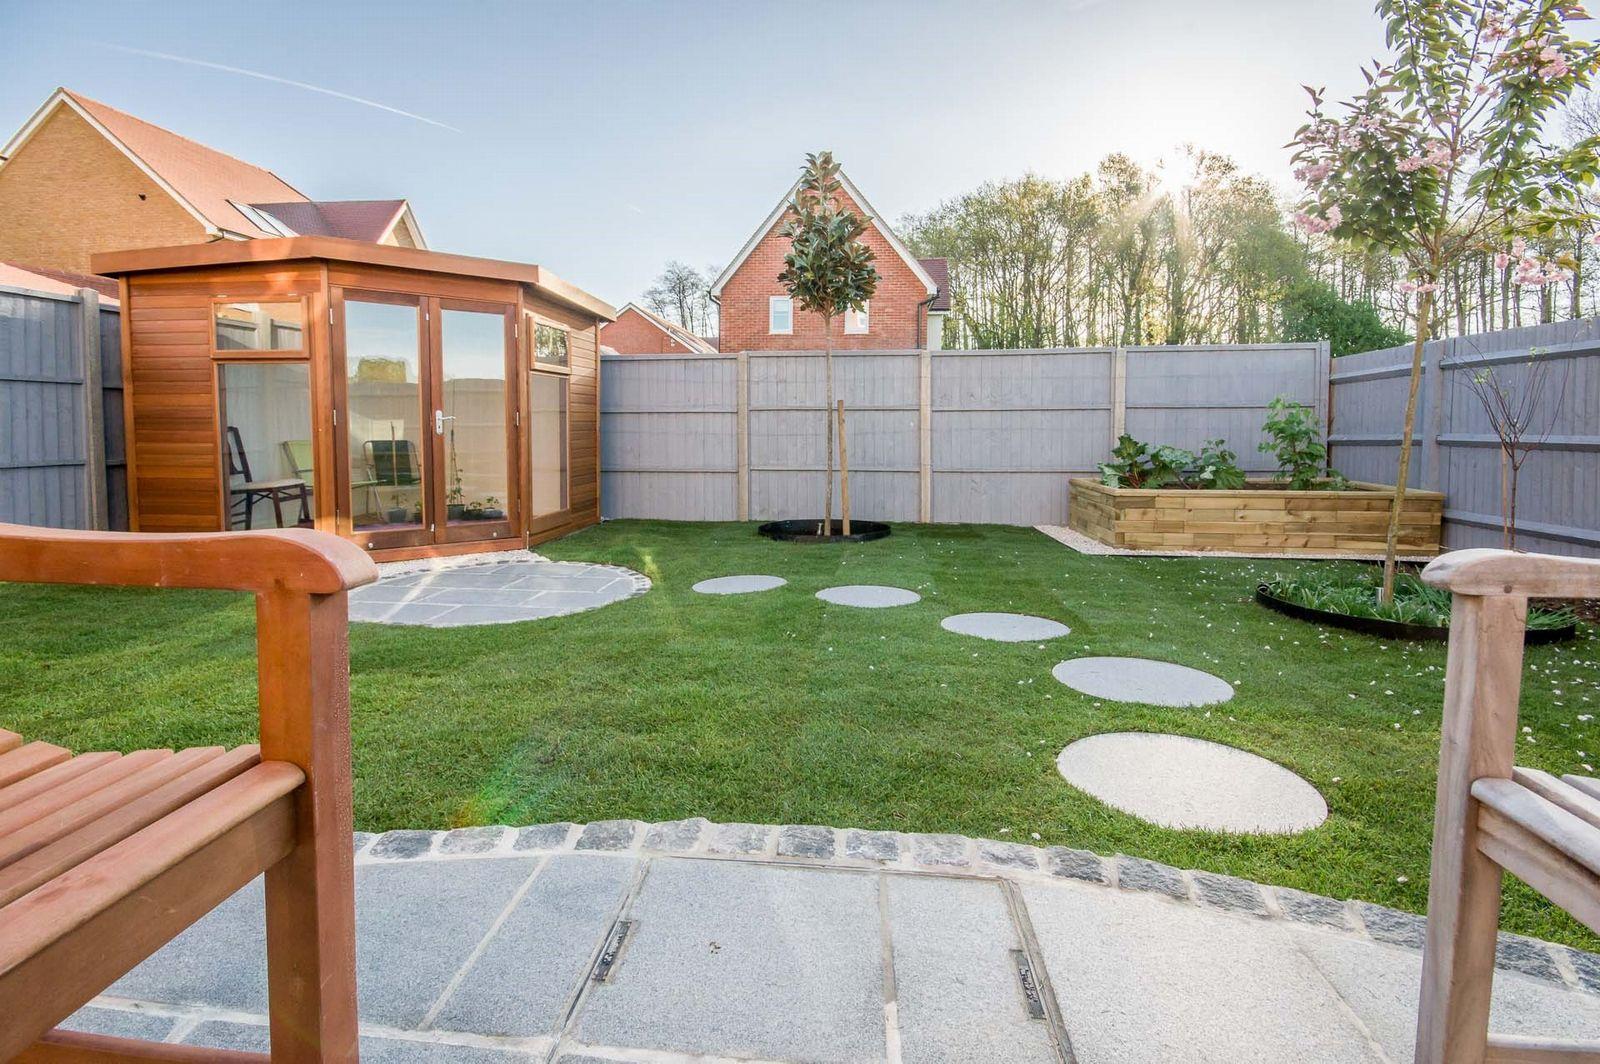 Malvern Corner Studio Pent in a garden setting